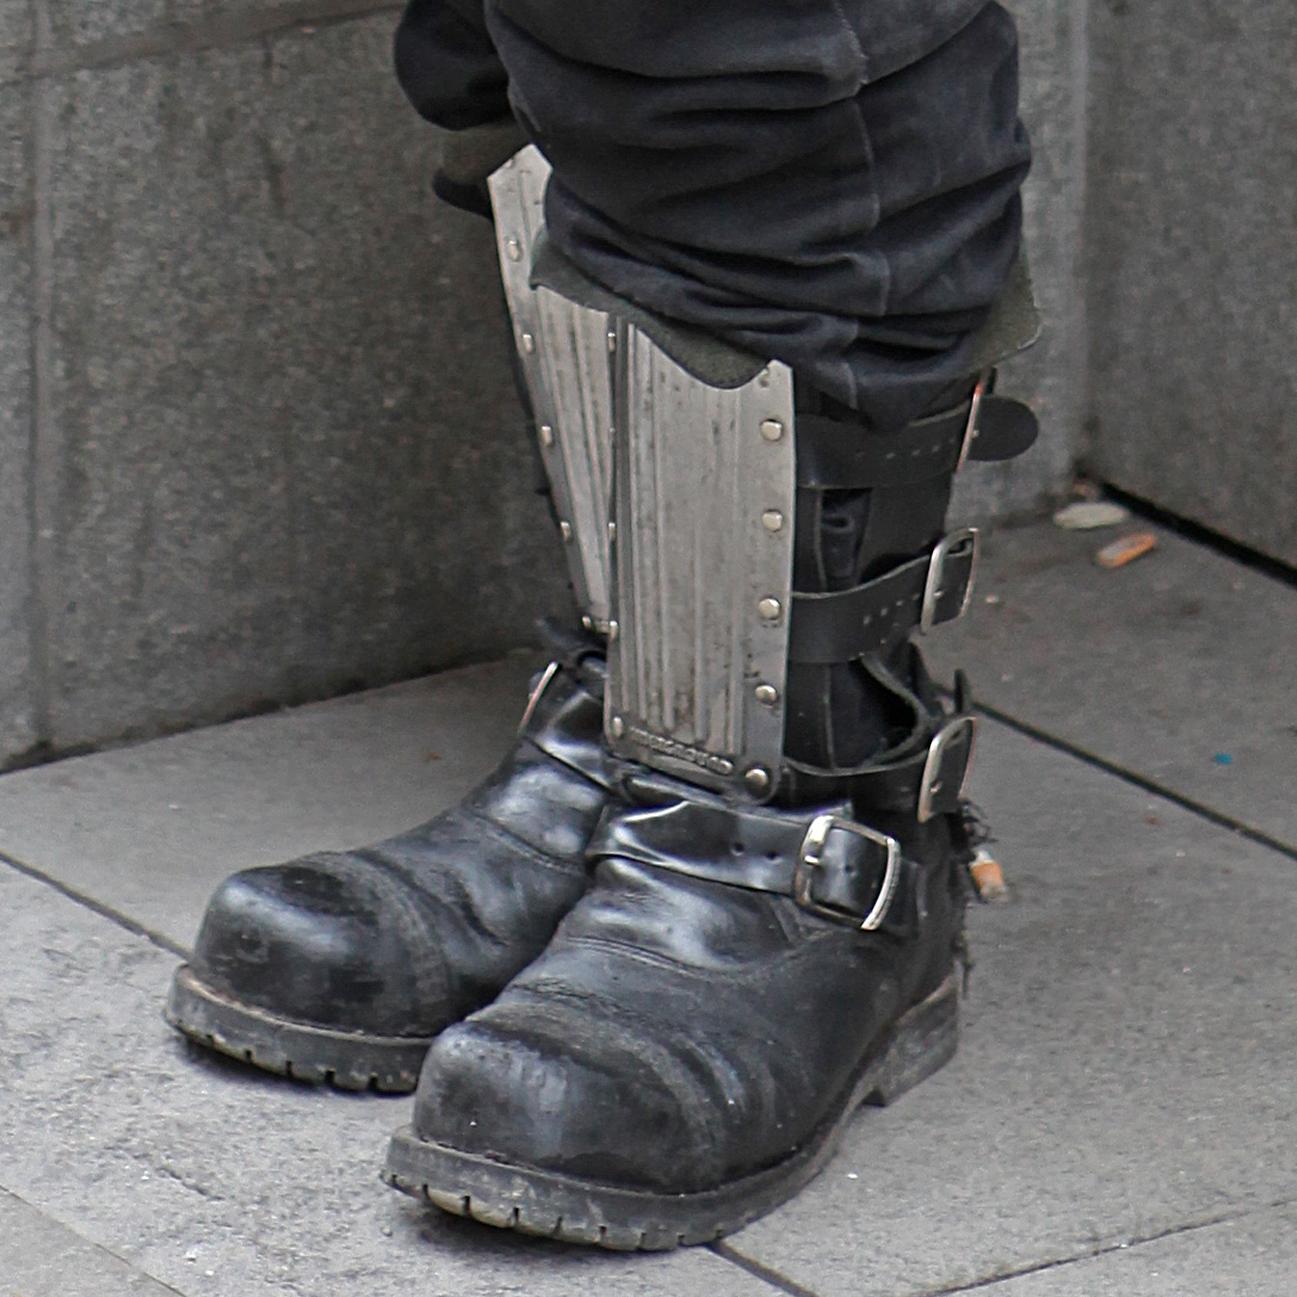 File:Black boots.jpg - Wikimedia Commons